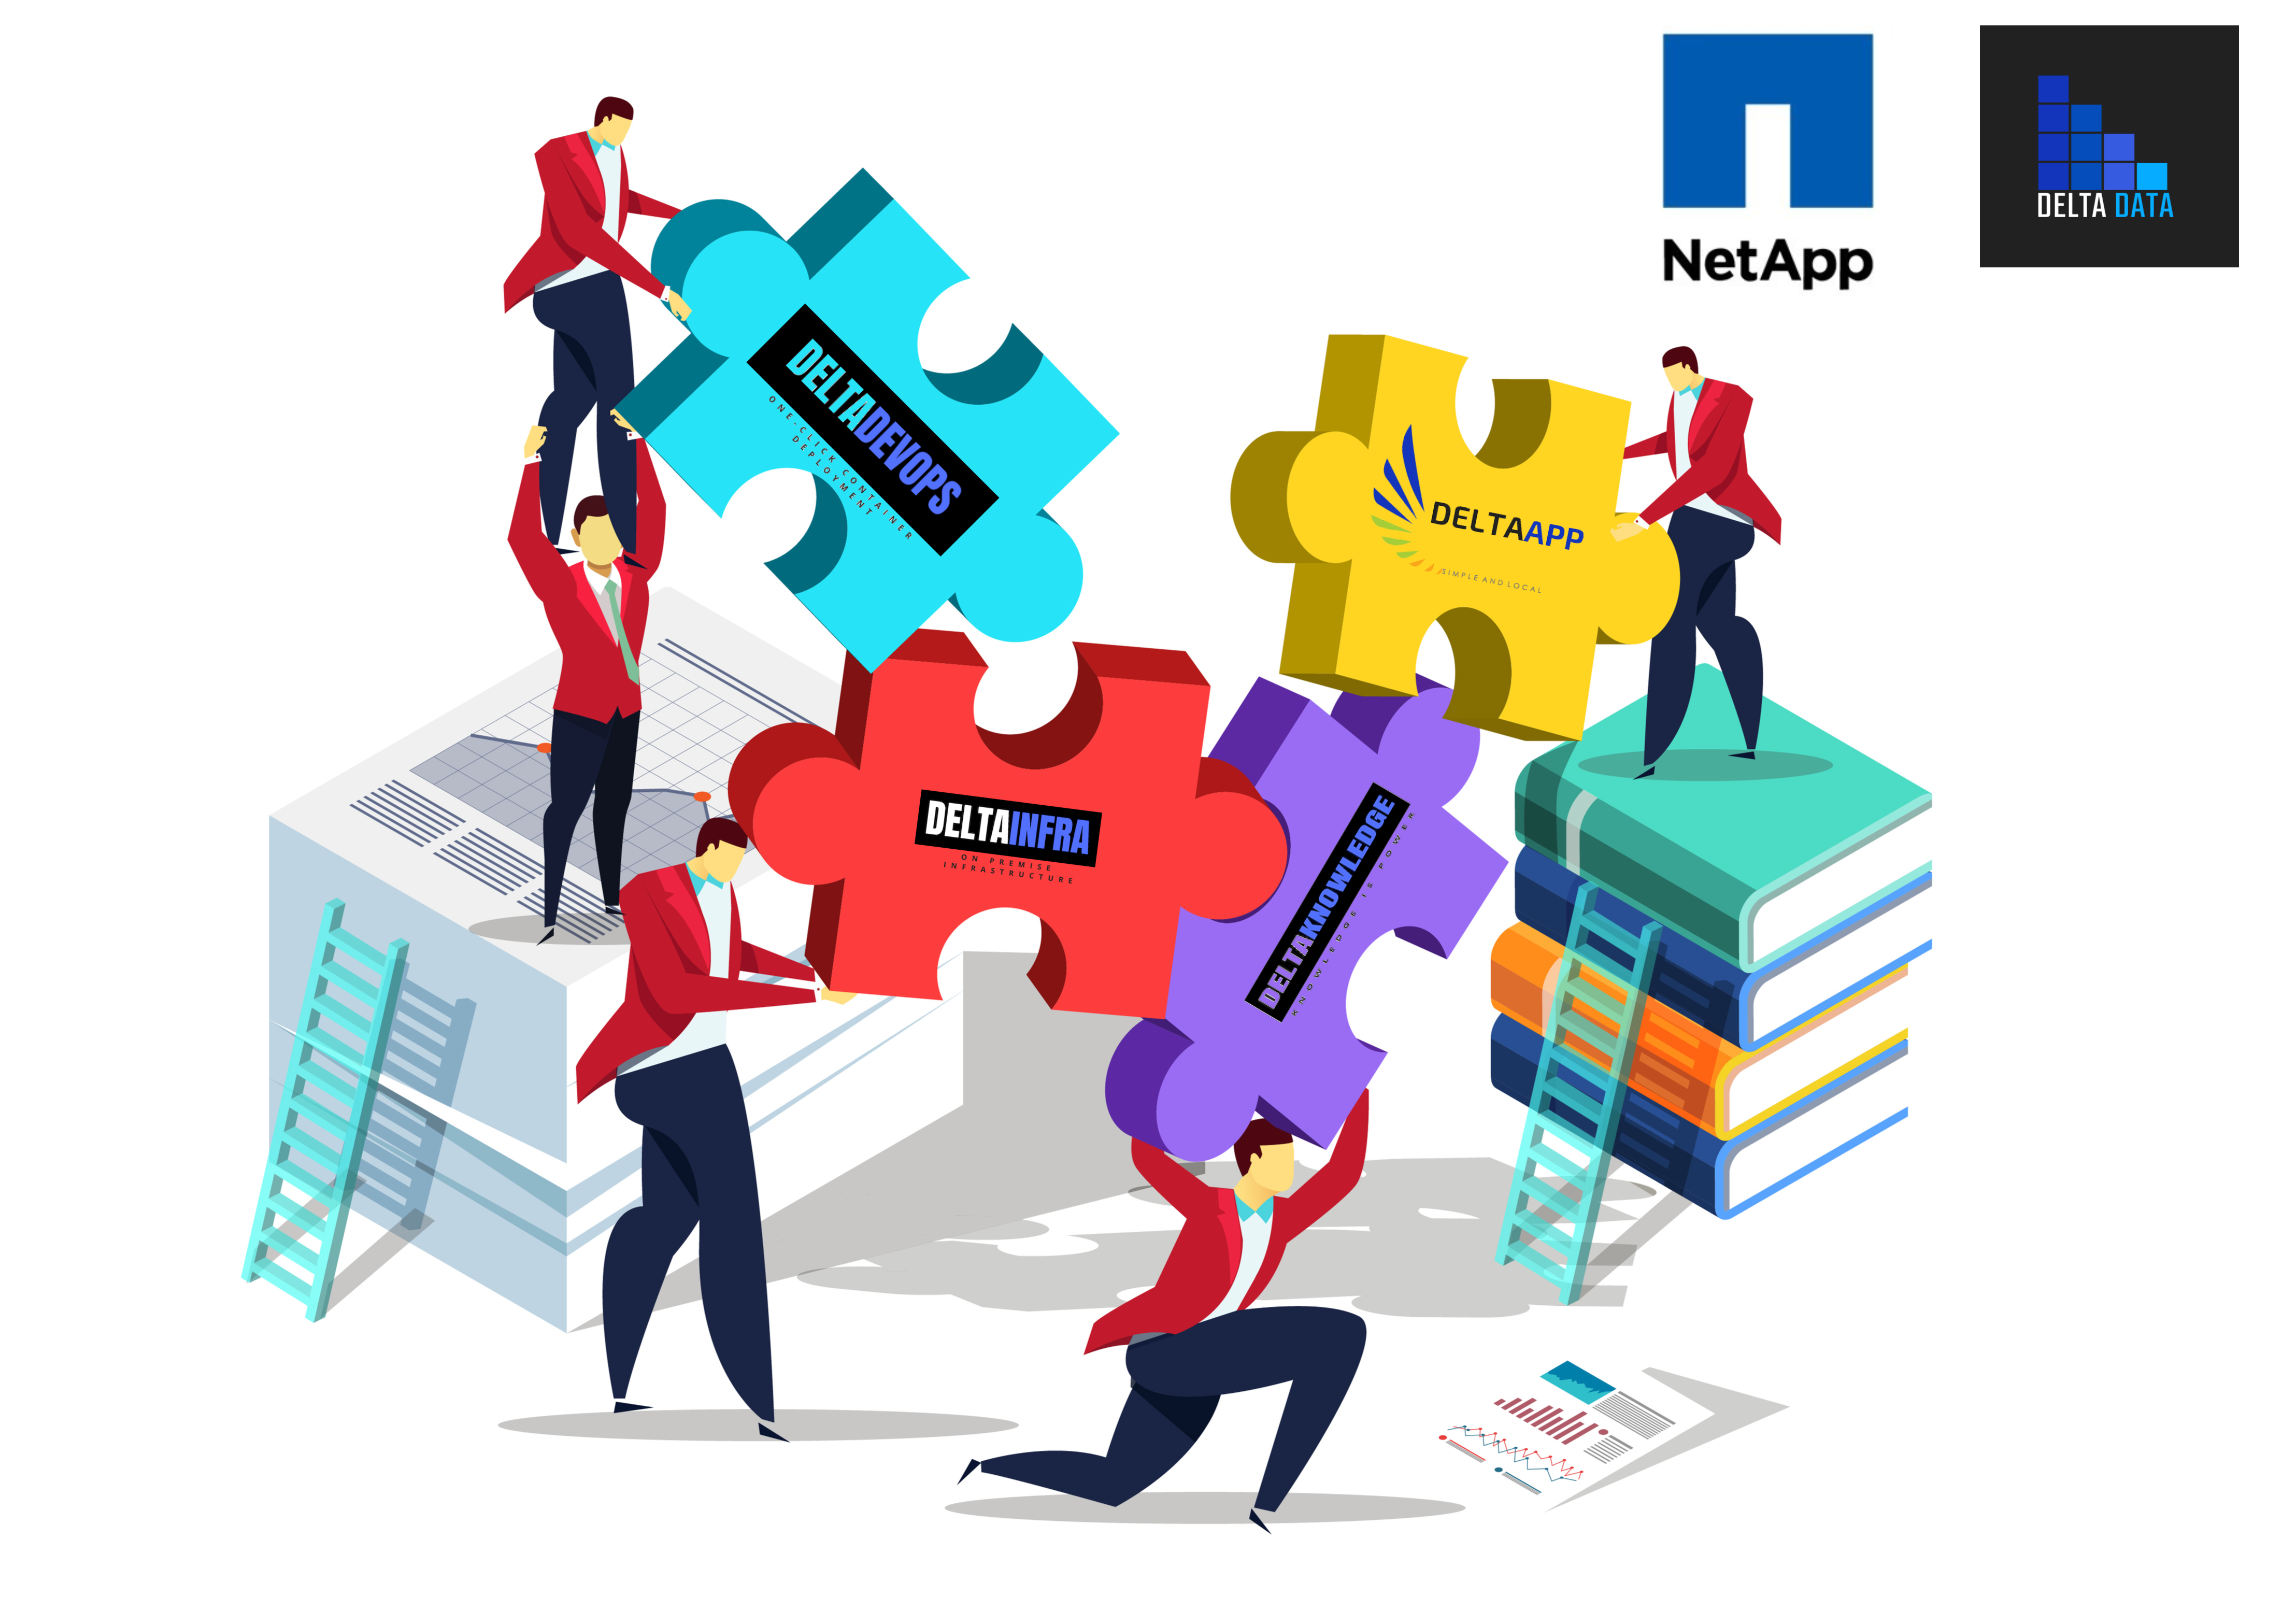 NetApp Deltadata Collaboration